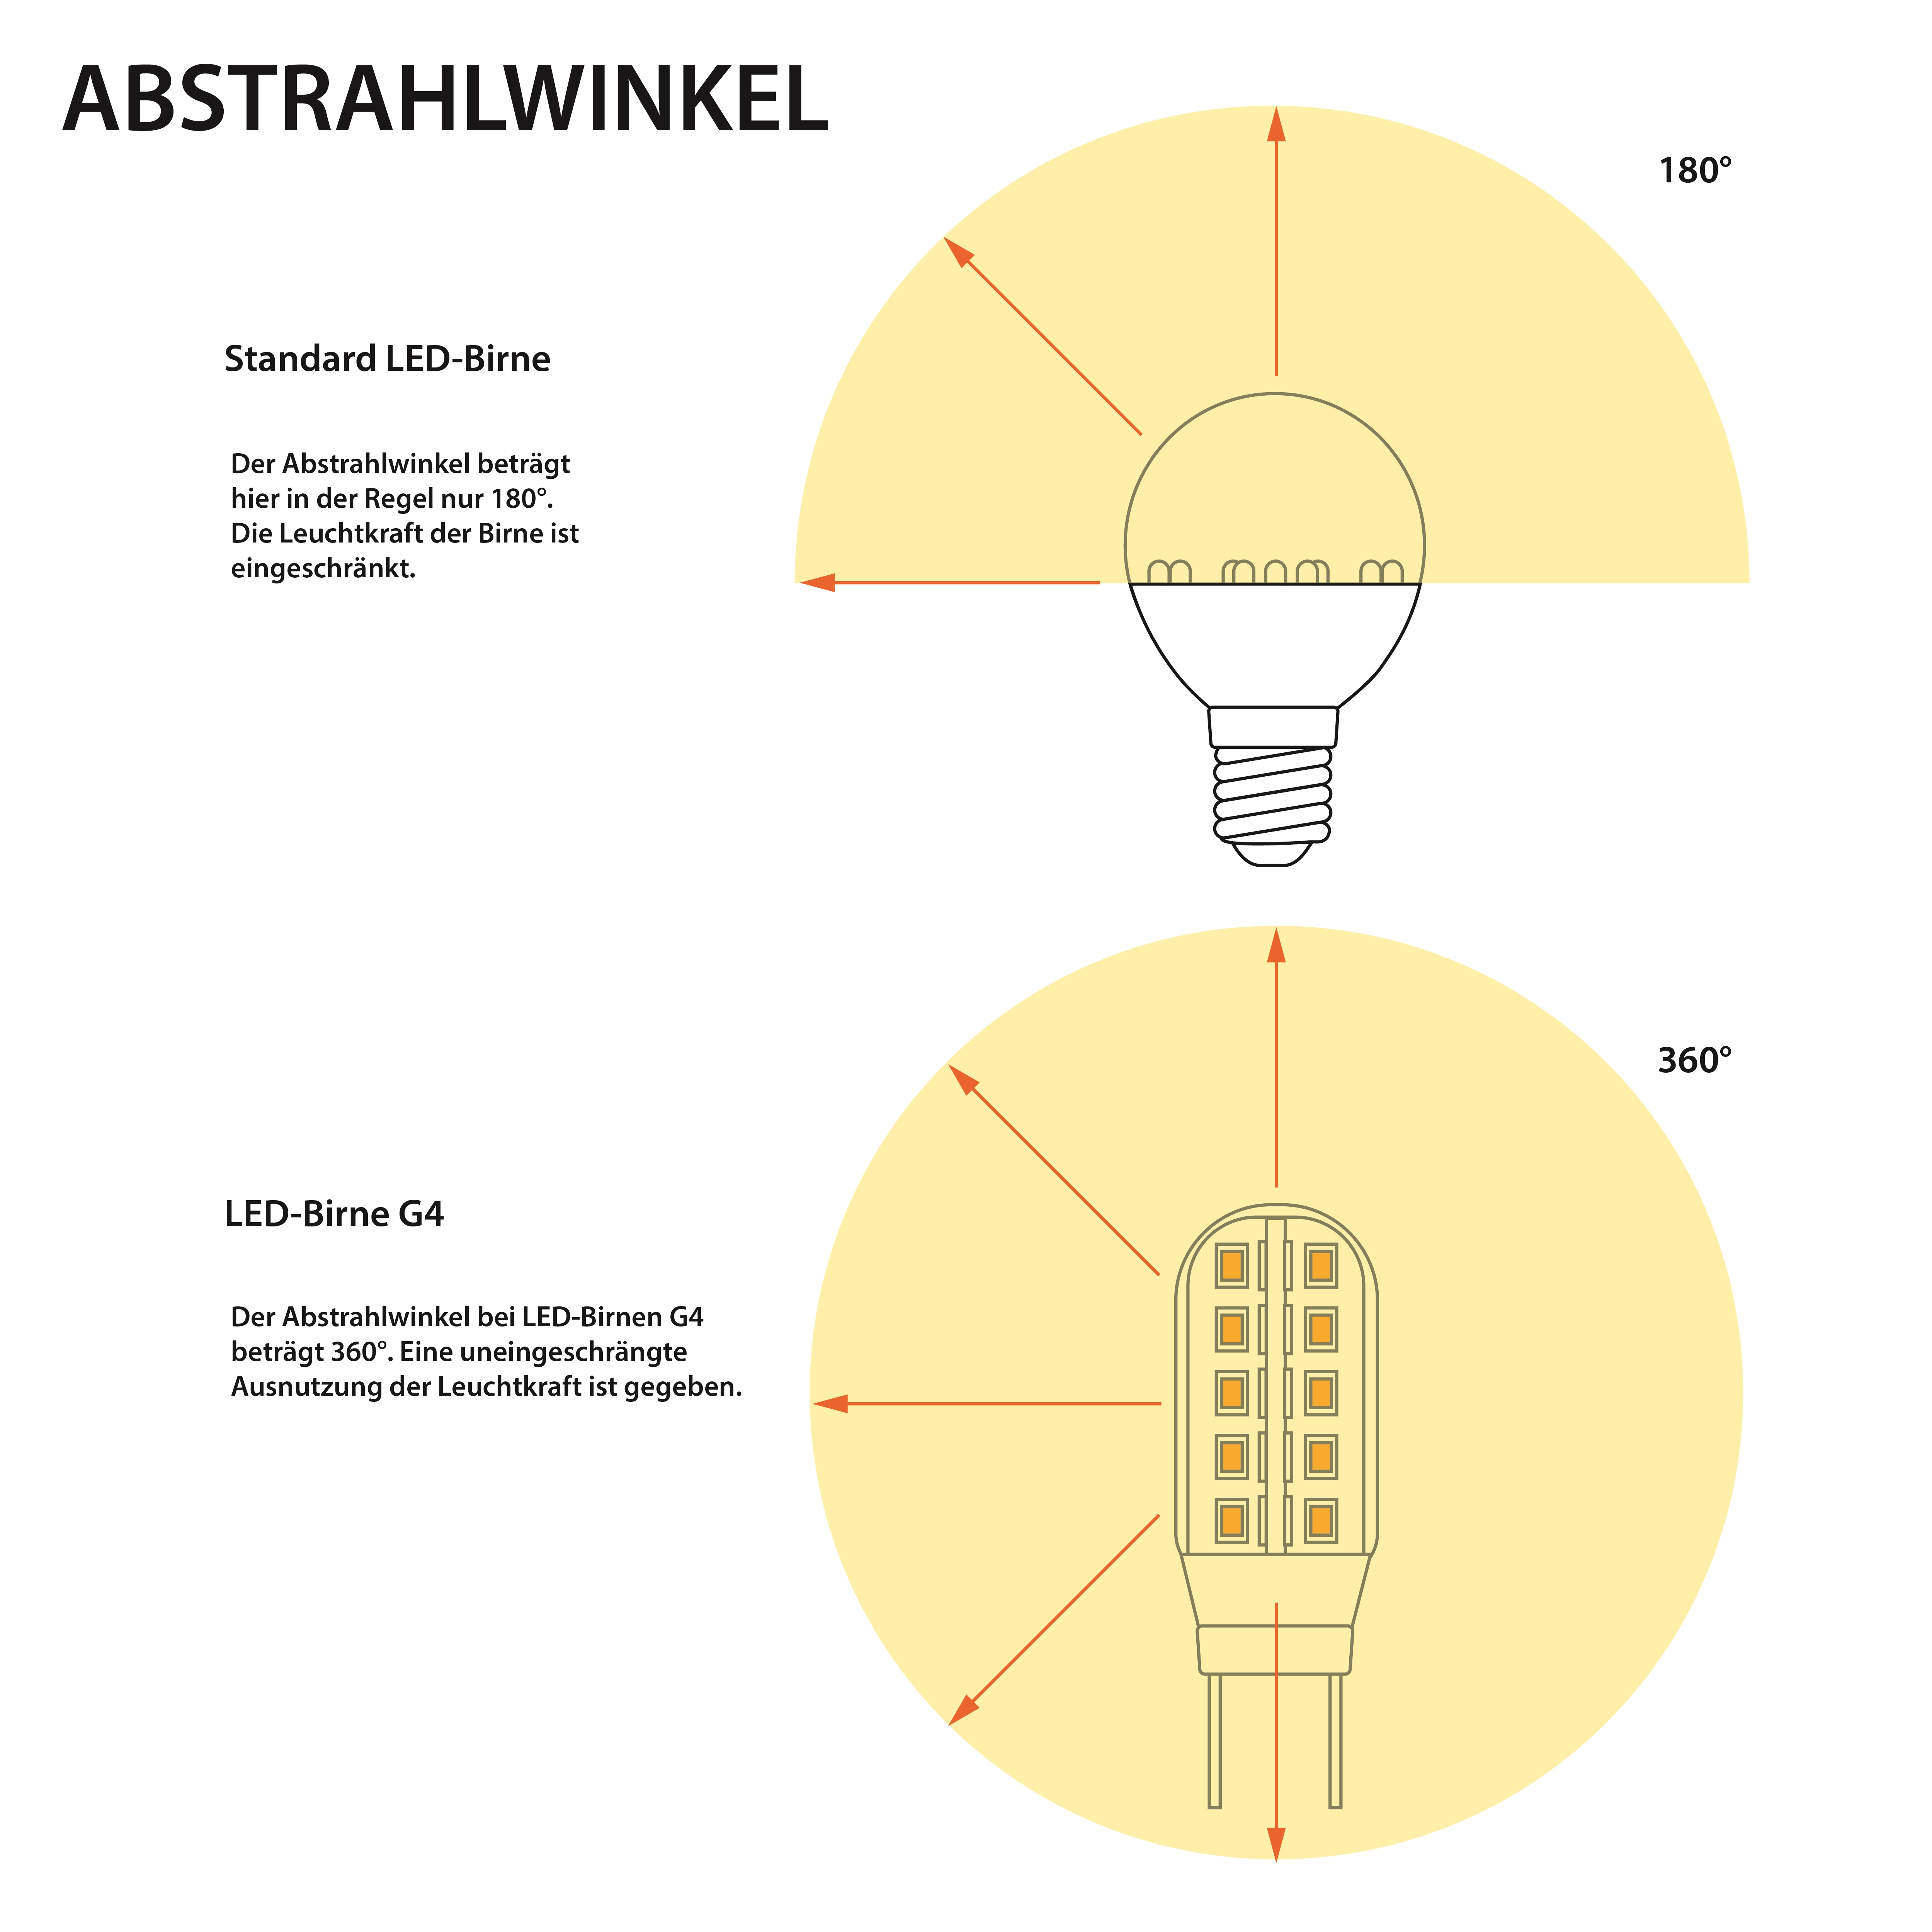 360_Abstrahlwinkel_Maiskolben_Birne_G4 Fabelhafte Led Lampen G4 Fassung Dekorationen